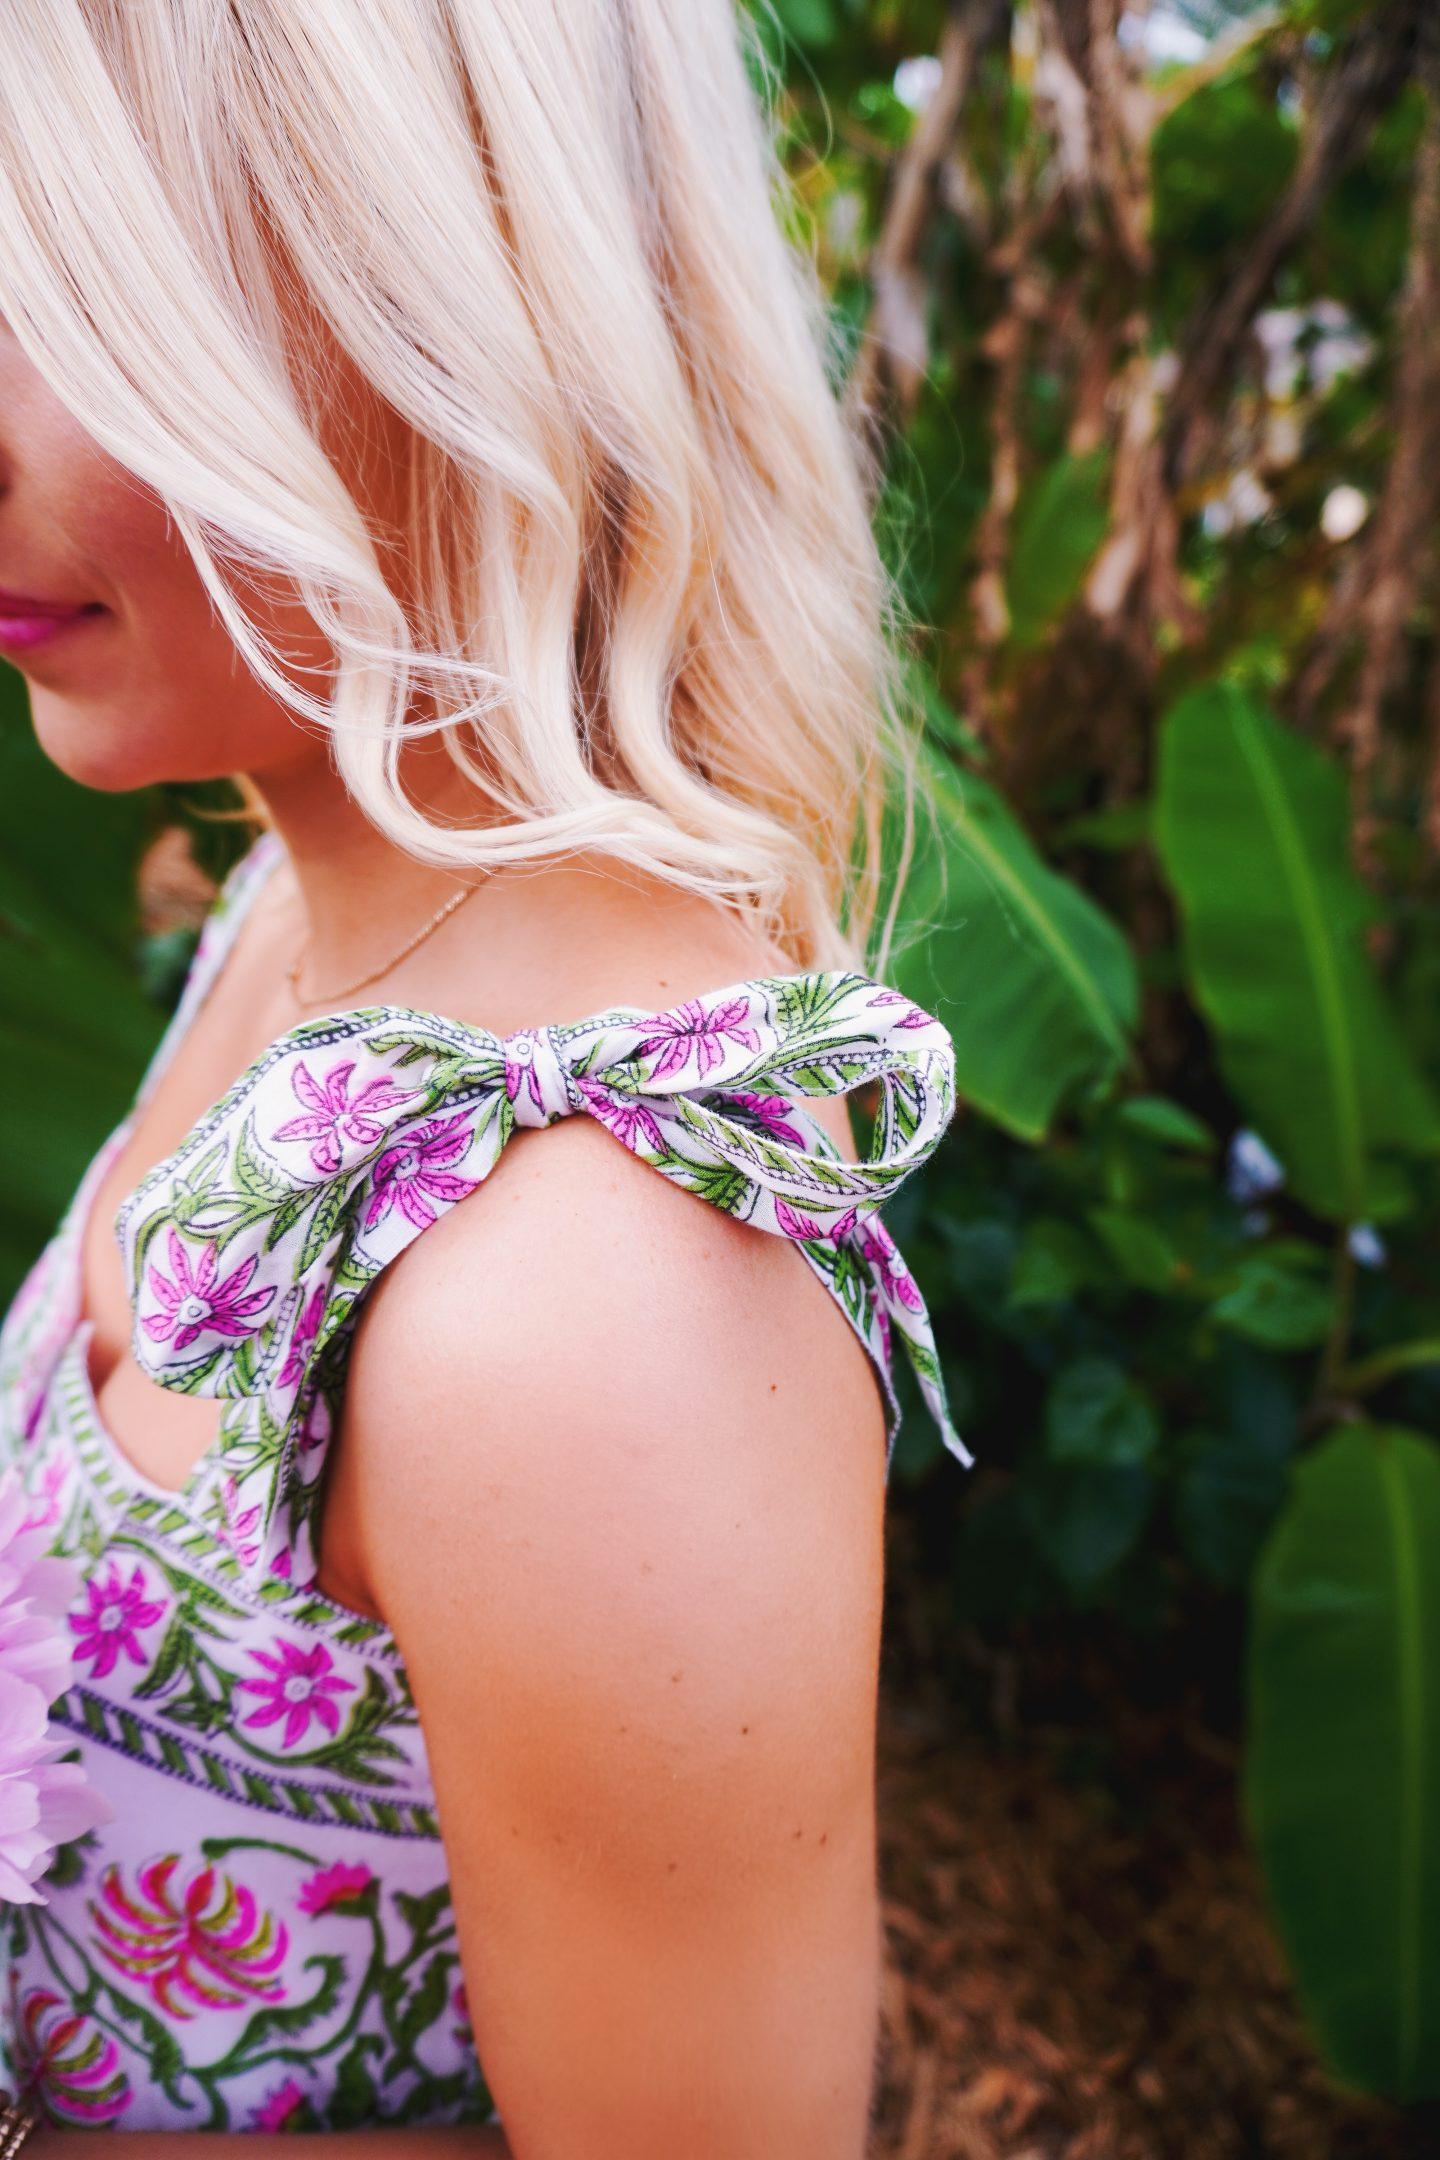 Juliet Dunn block print cotton tie dress in Vero Beach, FL